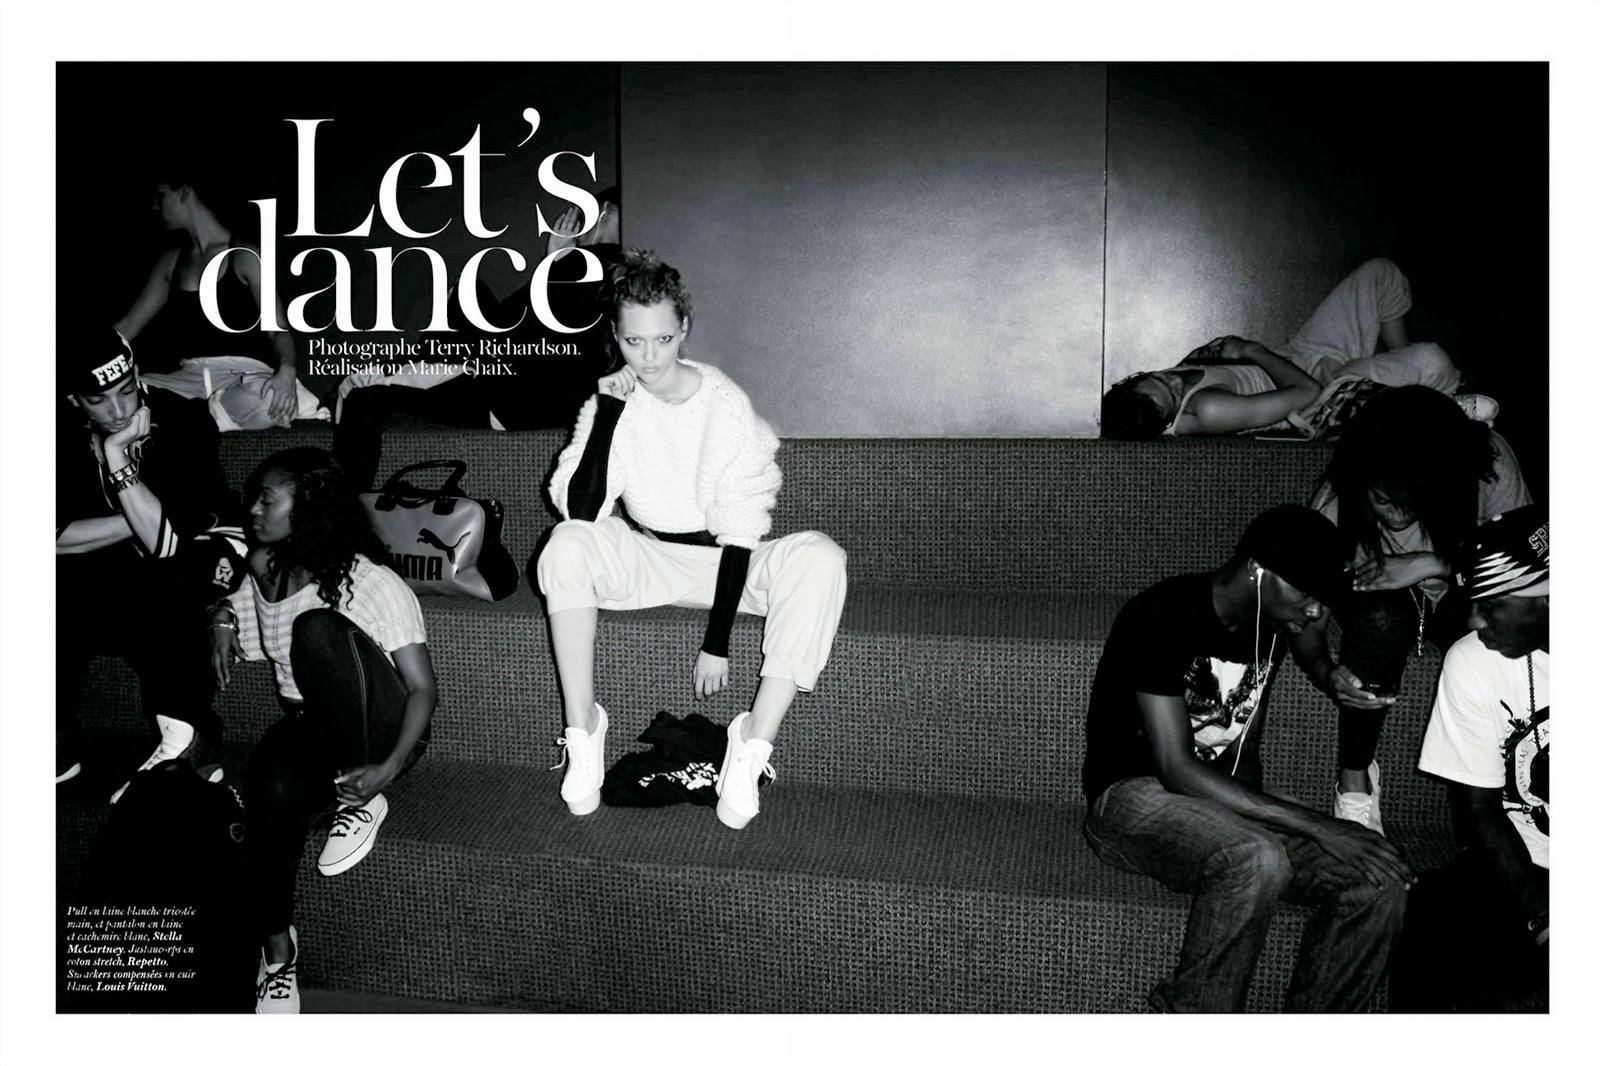 http://4.bp.blogspot.com/-uT5W-uFjnII/TtcS-6mLZmI/AAAAAAAAnXM/MIyYQfQwkTs/s1600/let%2527s+dance+sasha+pivovarova+terry+richardson+marie+chaix+vogue+paris%252C+december+2011%253Ajanuary+2012+1.jpg